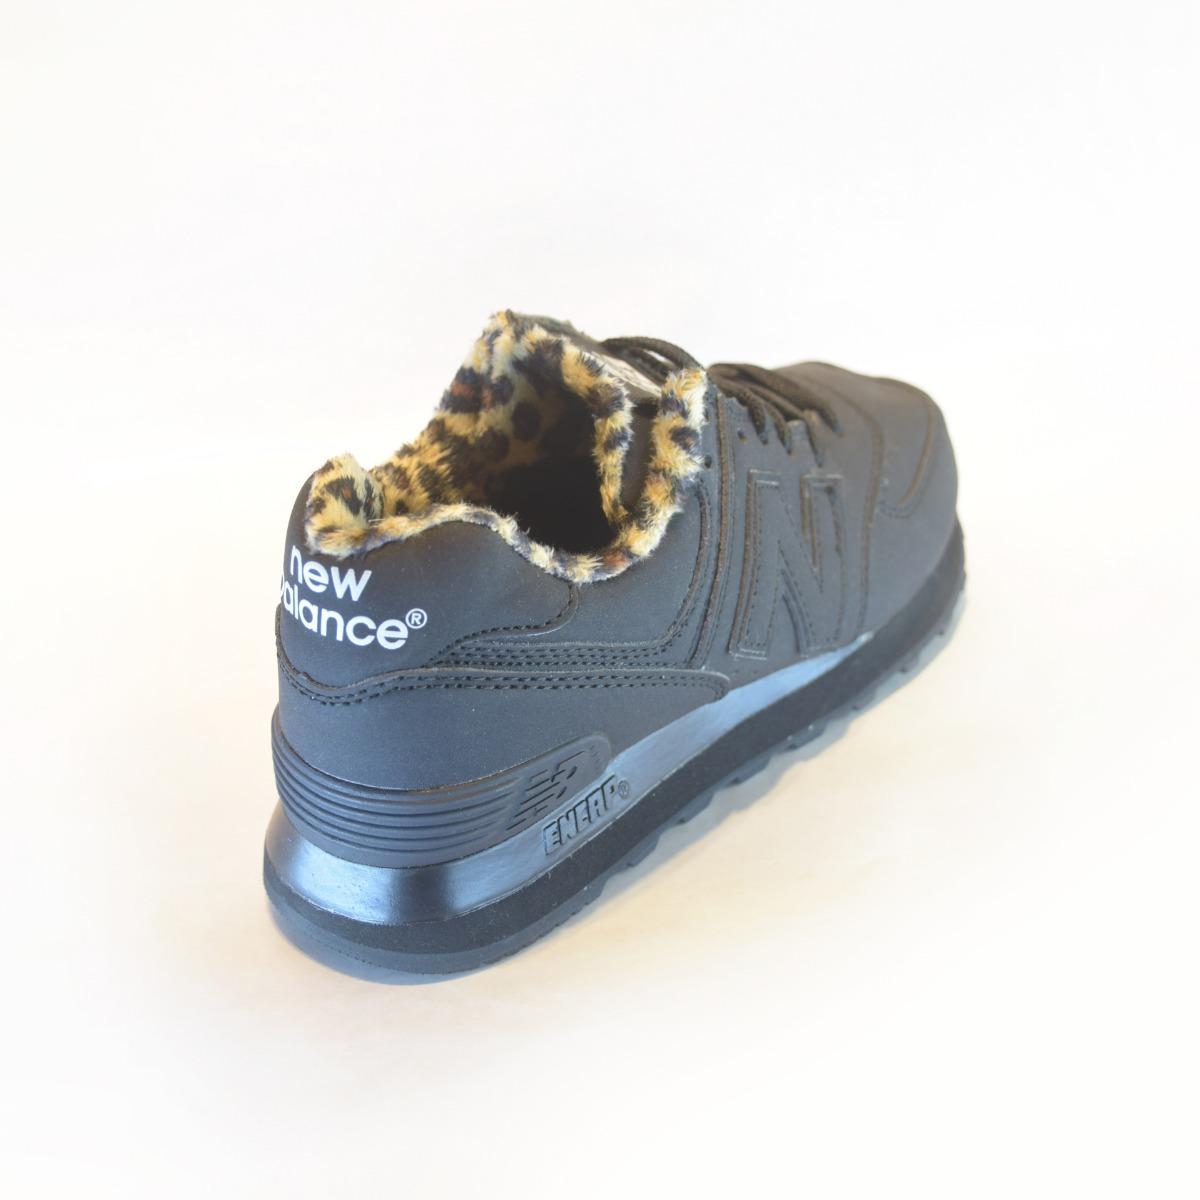 zapatillas chica new balance